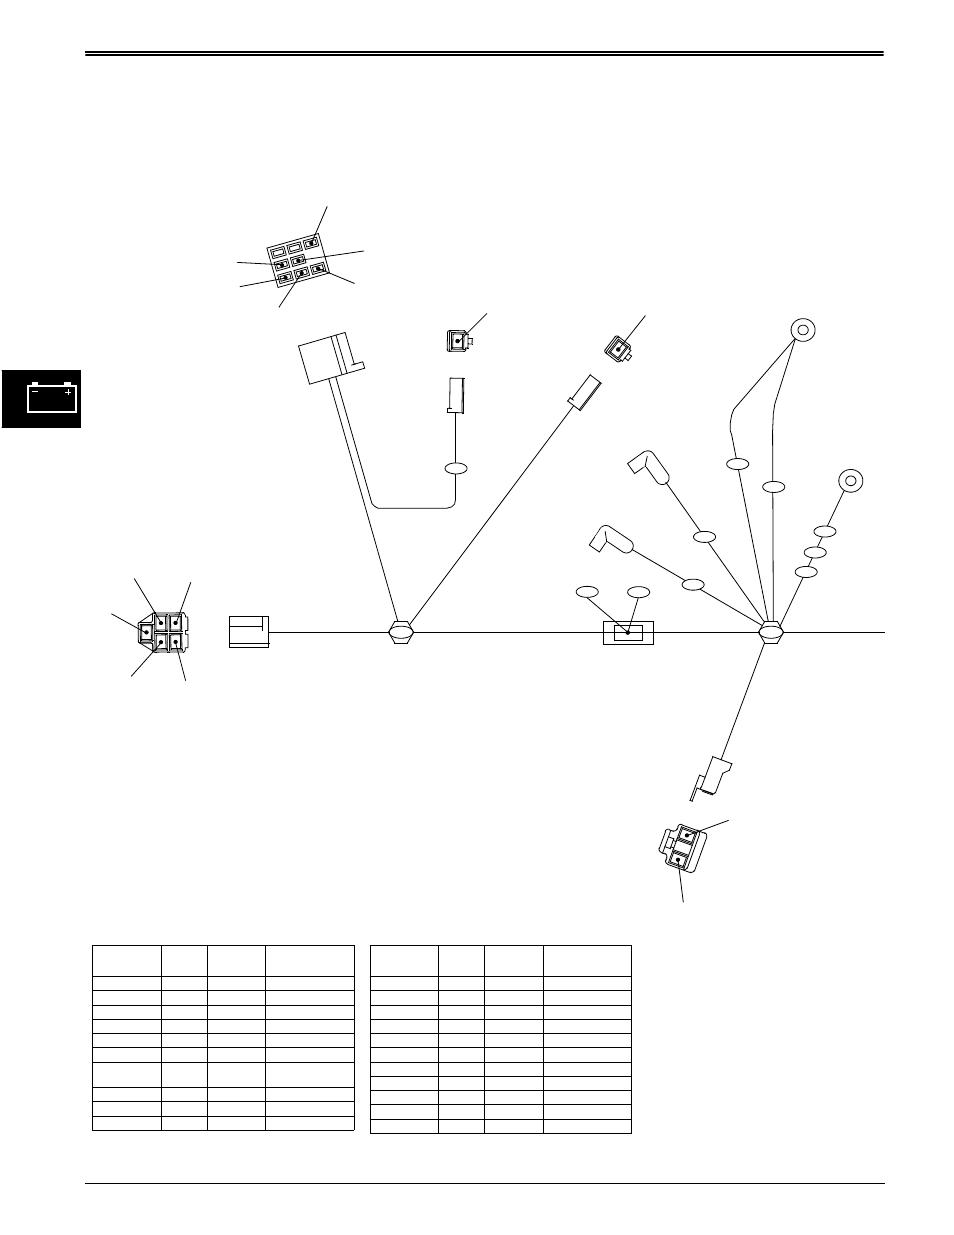 medium resolution of wiring harness diagrams electrical john deere stx38 user manual page 100 314